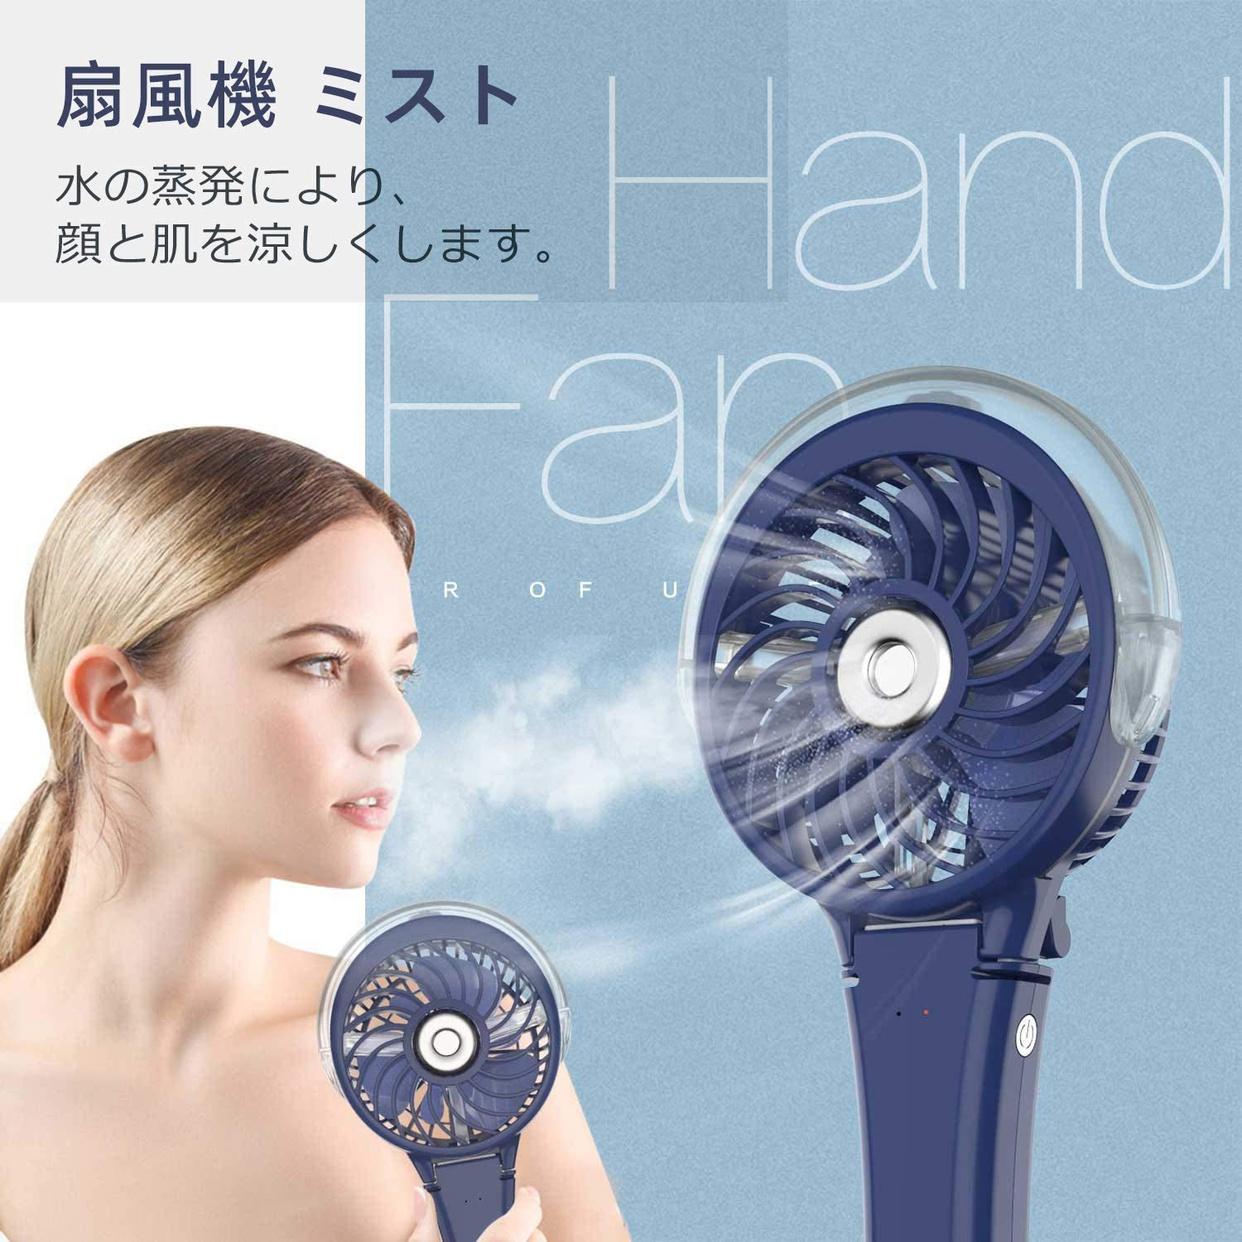 HandFan(ハンドファン) ミスト 手持ち扇風機の商品画像2